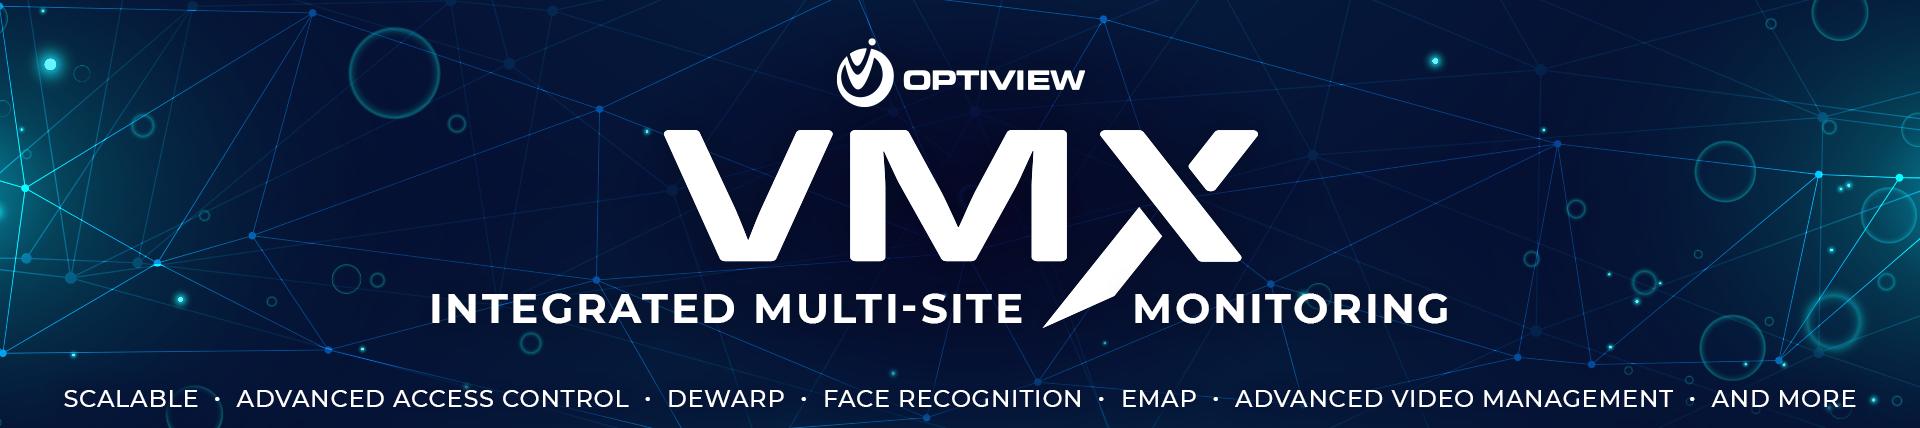 VMX Website Banner Ad